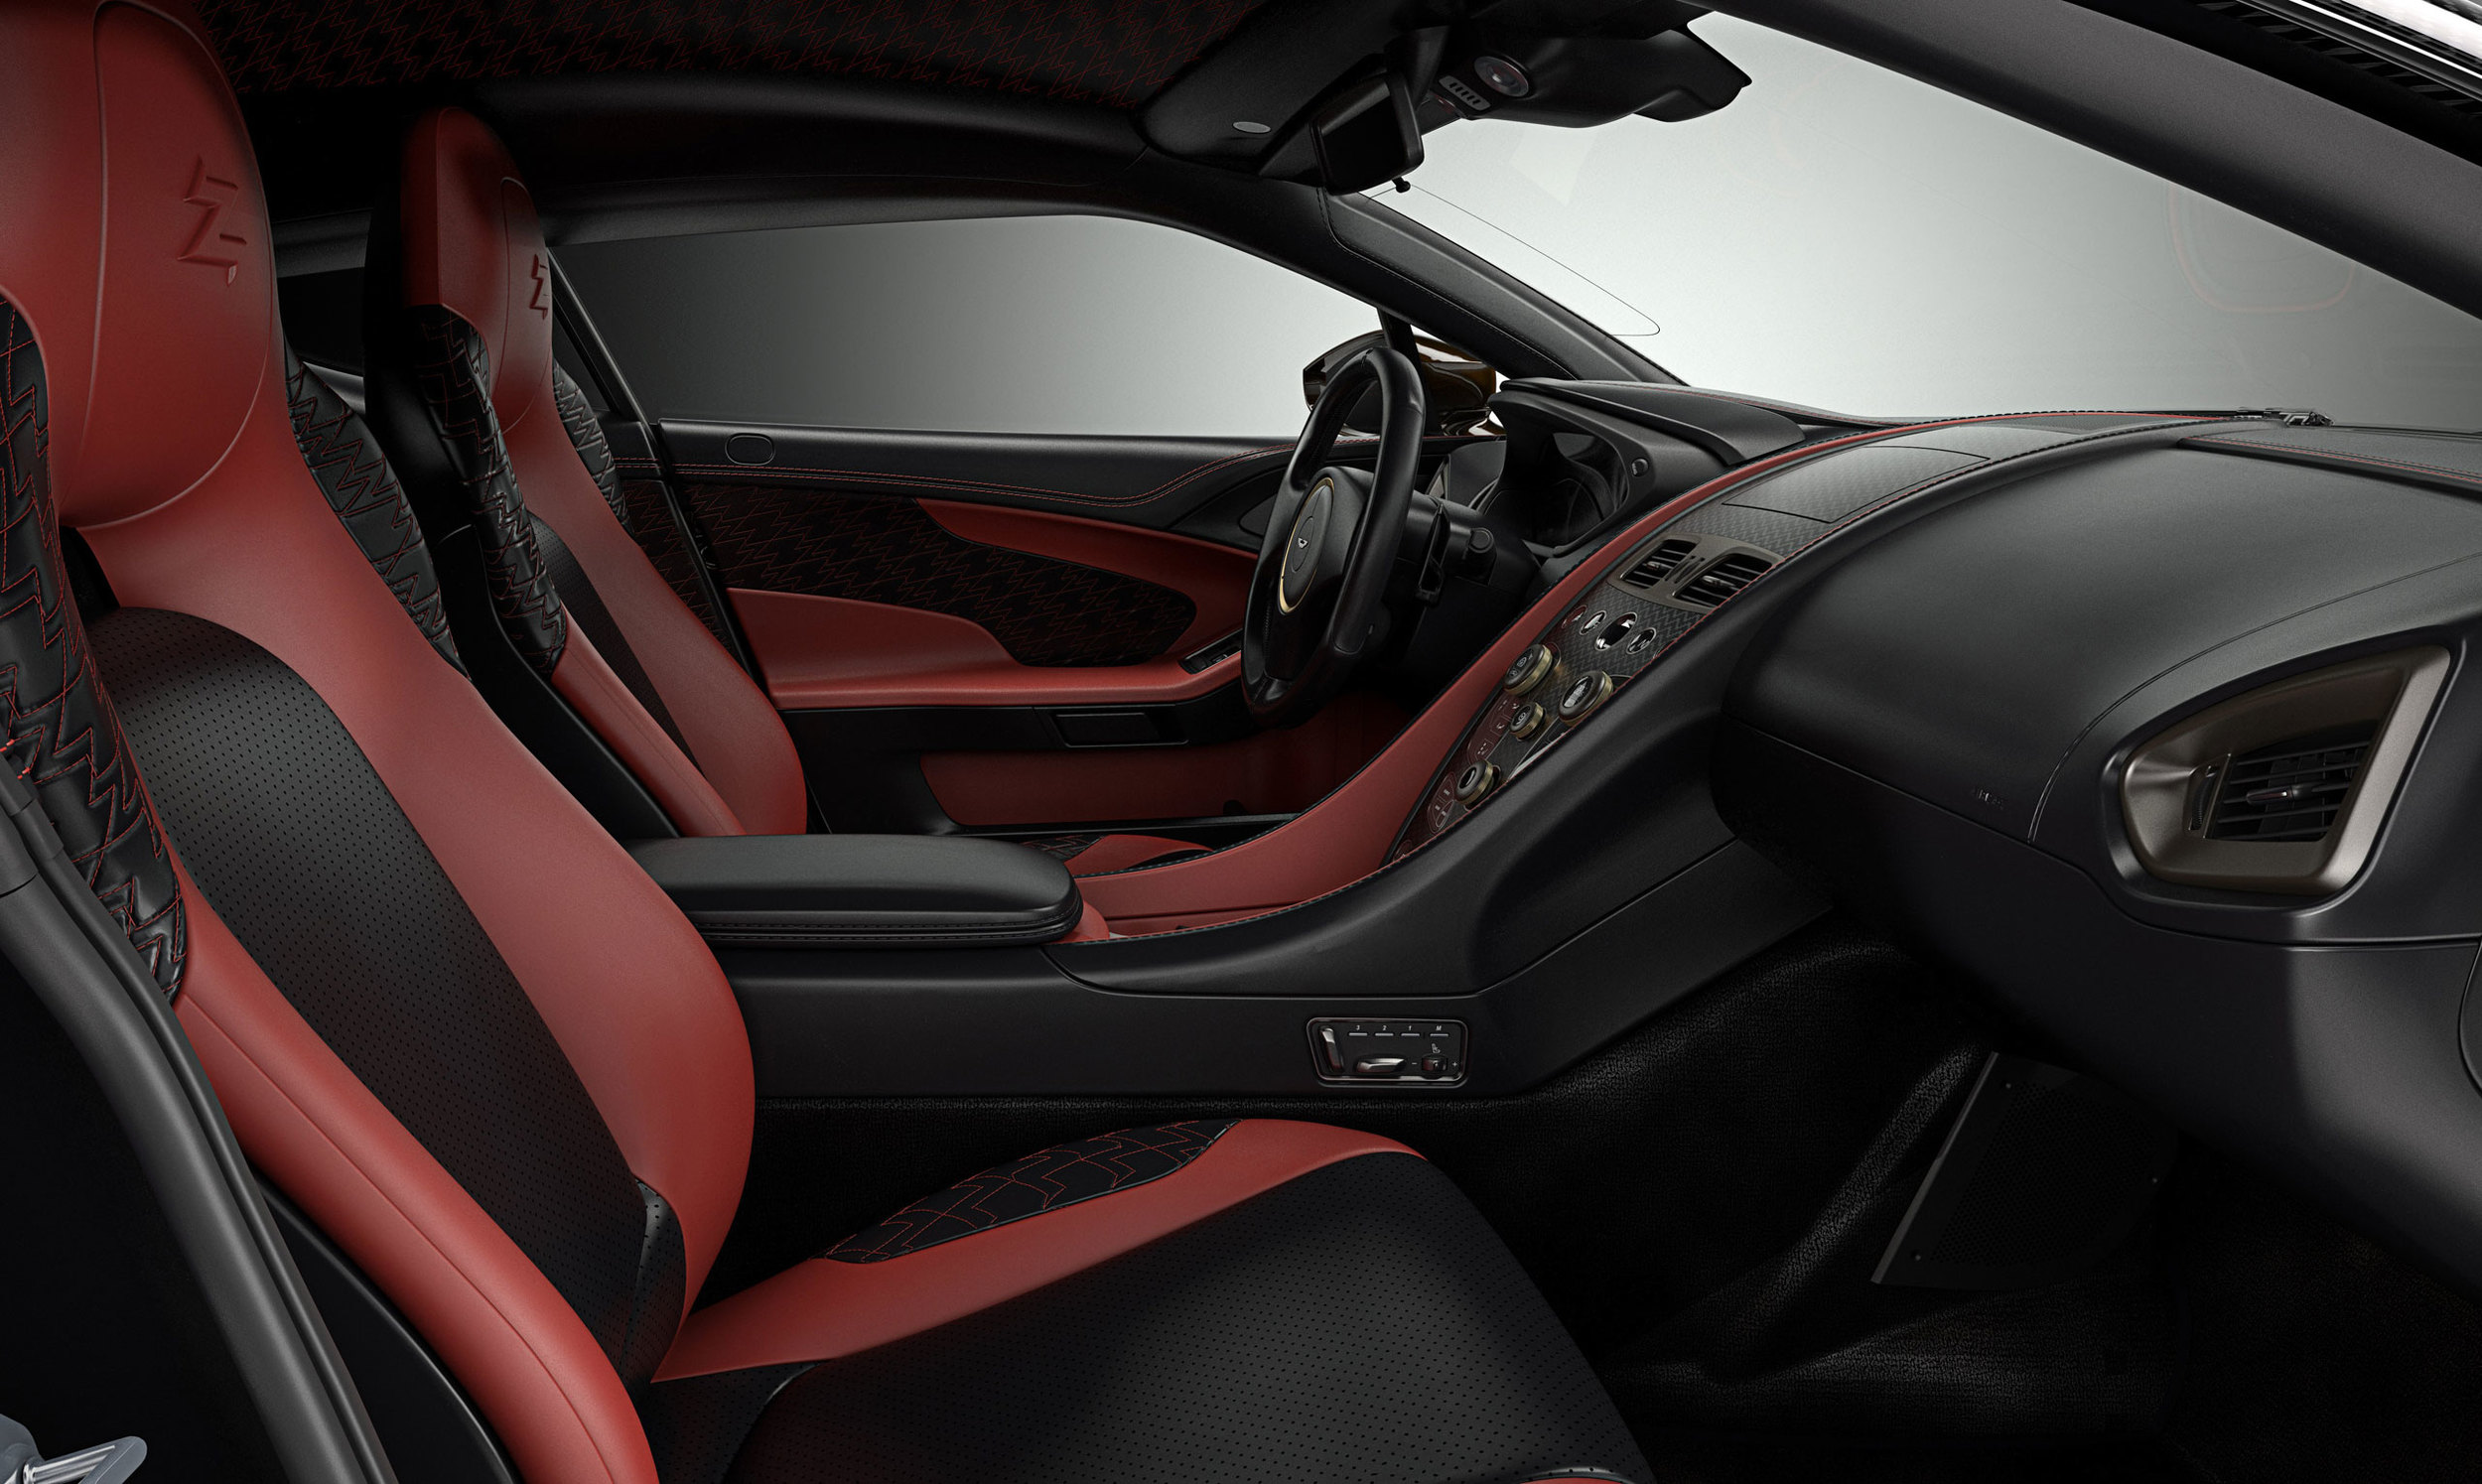 Aston-Martin-Vanquish-Zagato-Concept_10.jpg